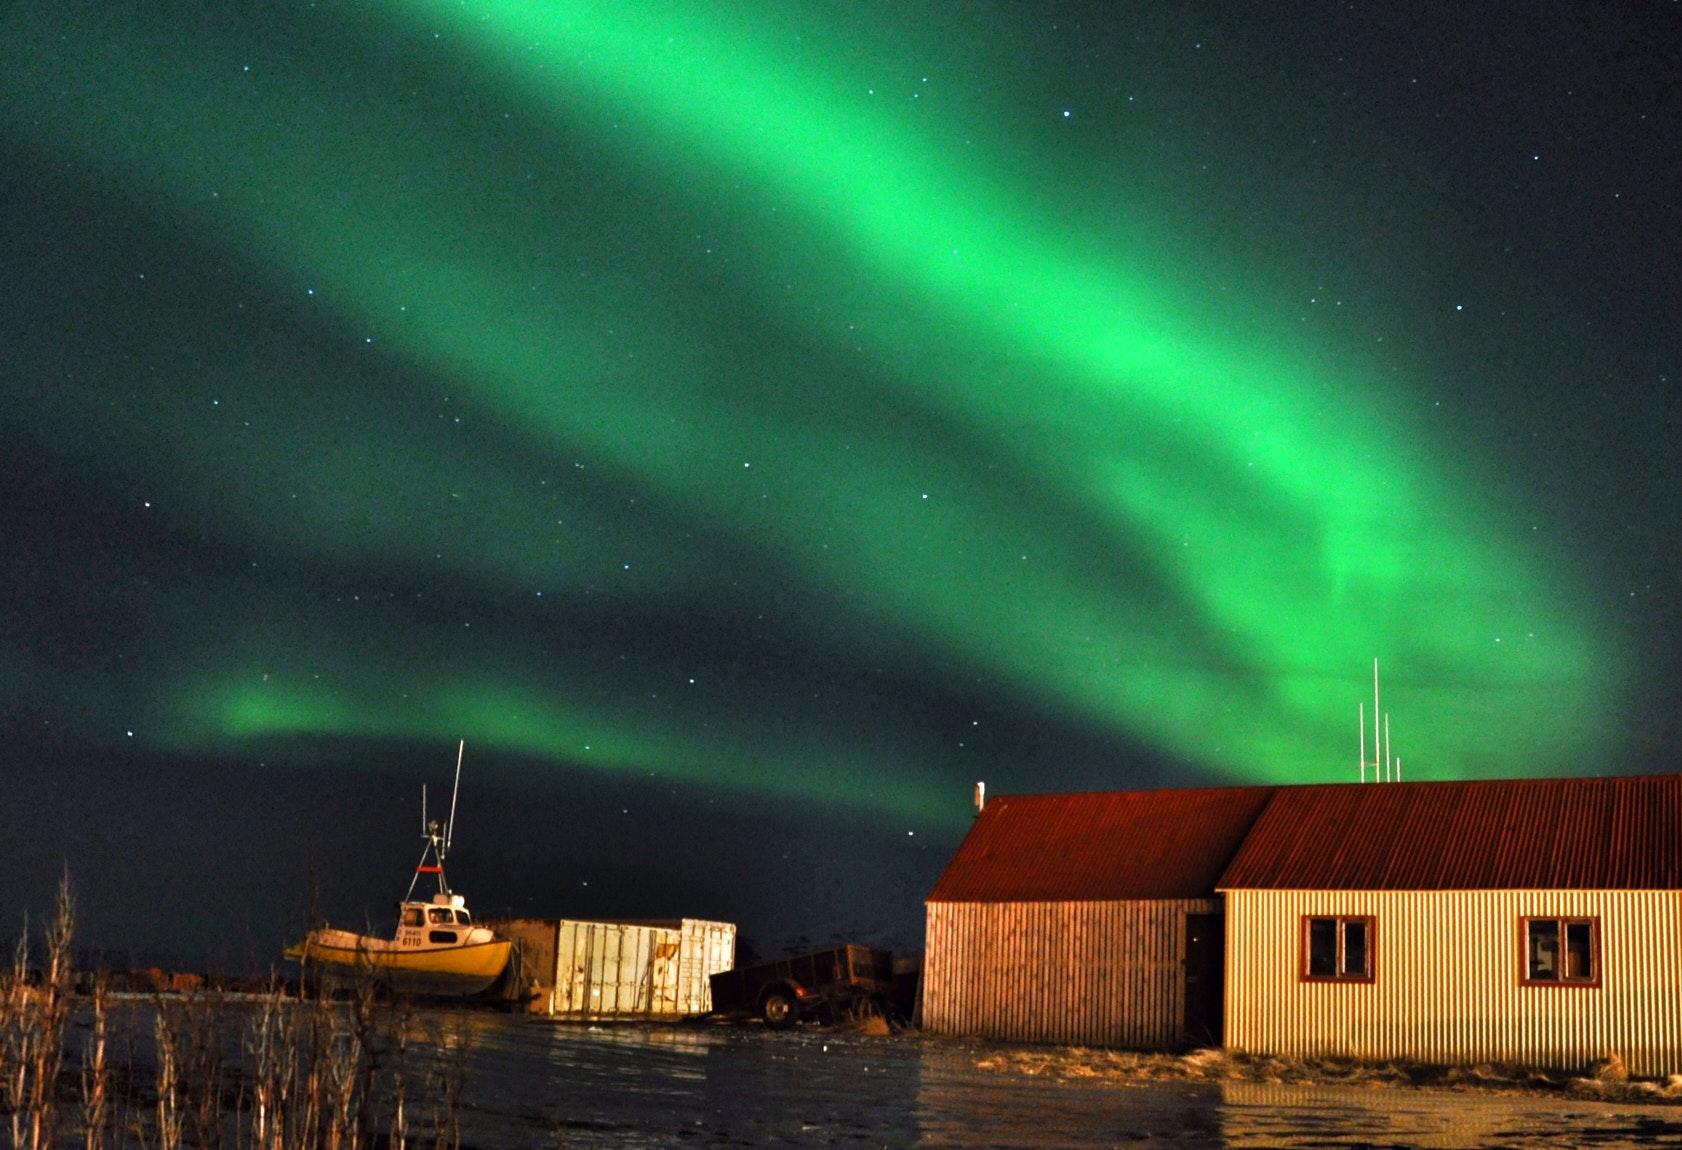 Aurora Borealis a.k.a. the northern lights in Snæfellsnes peninsula